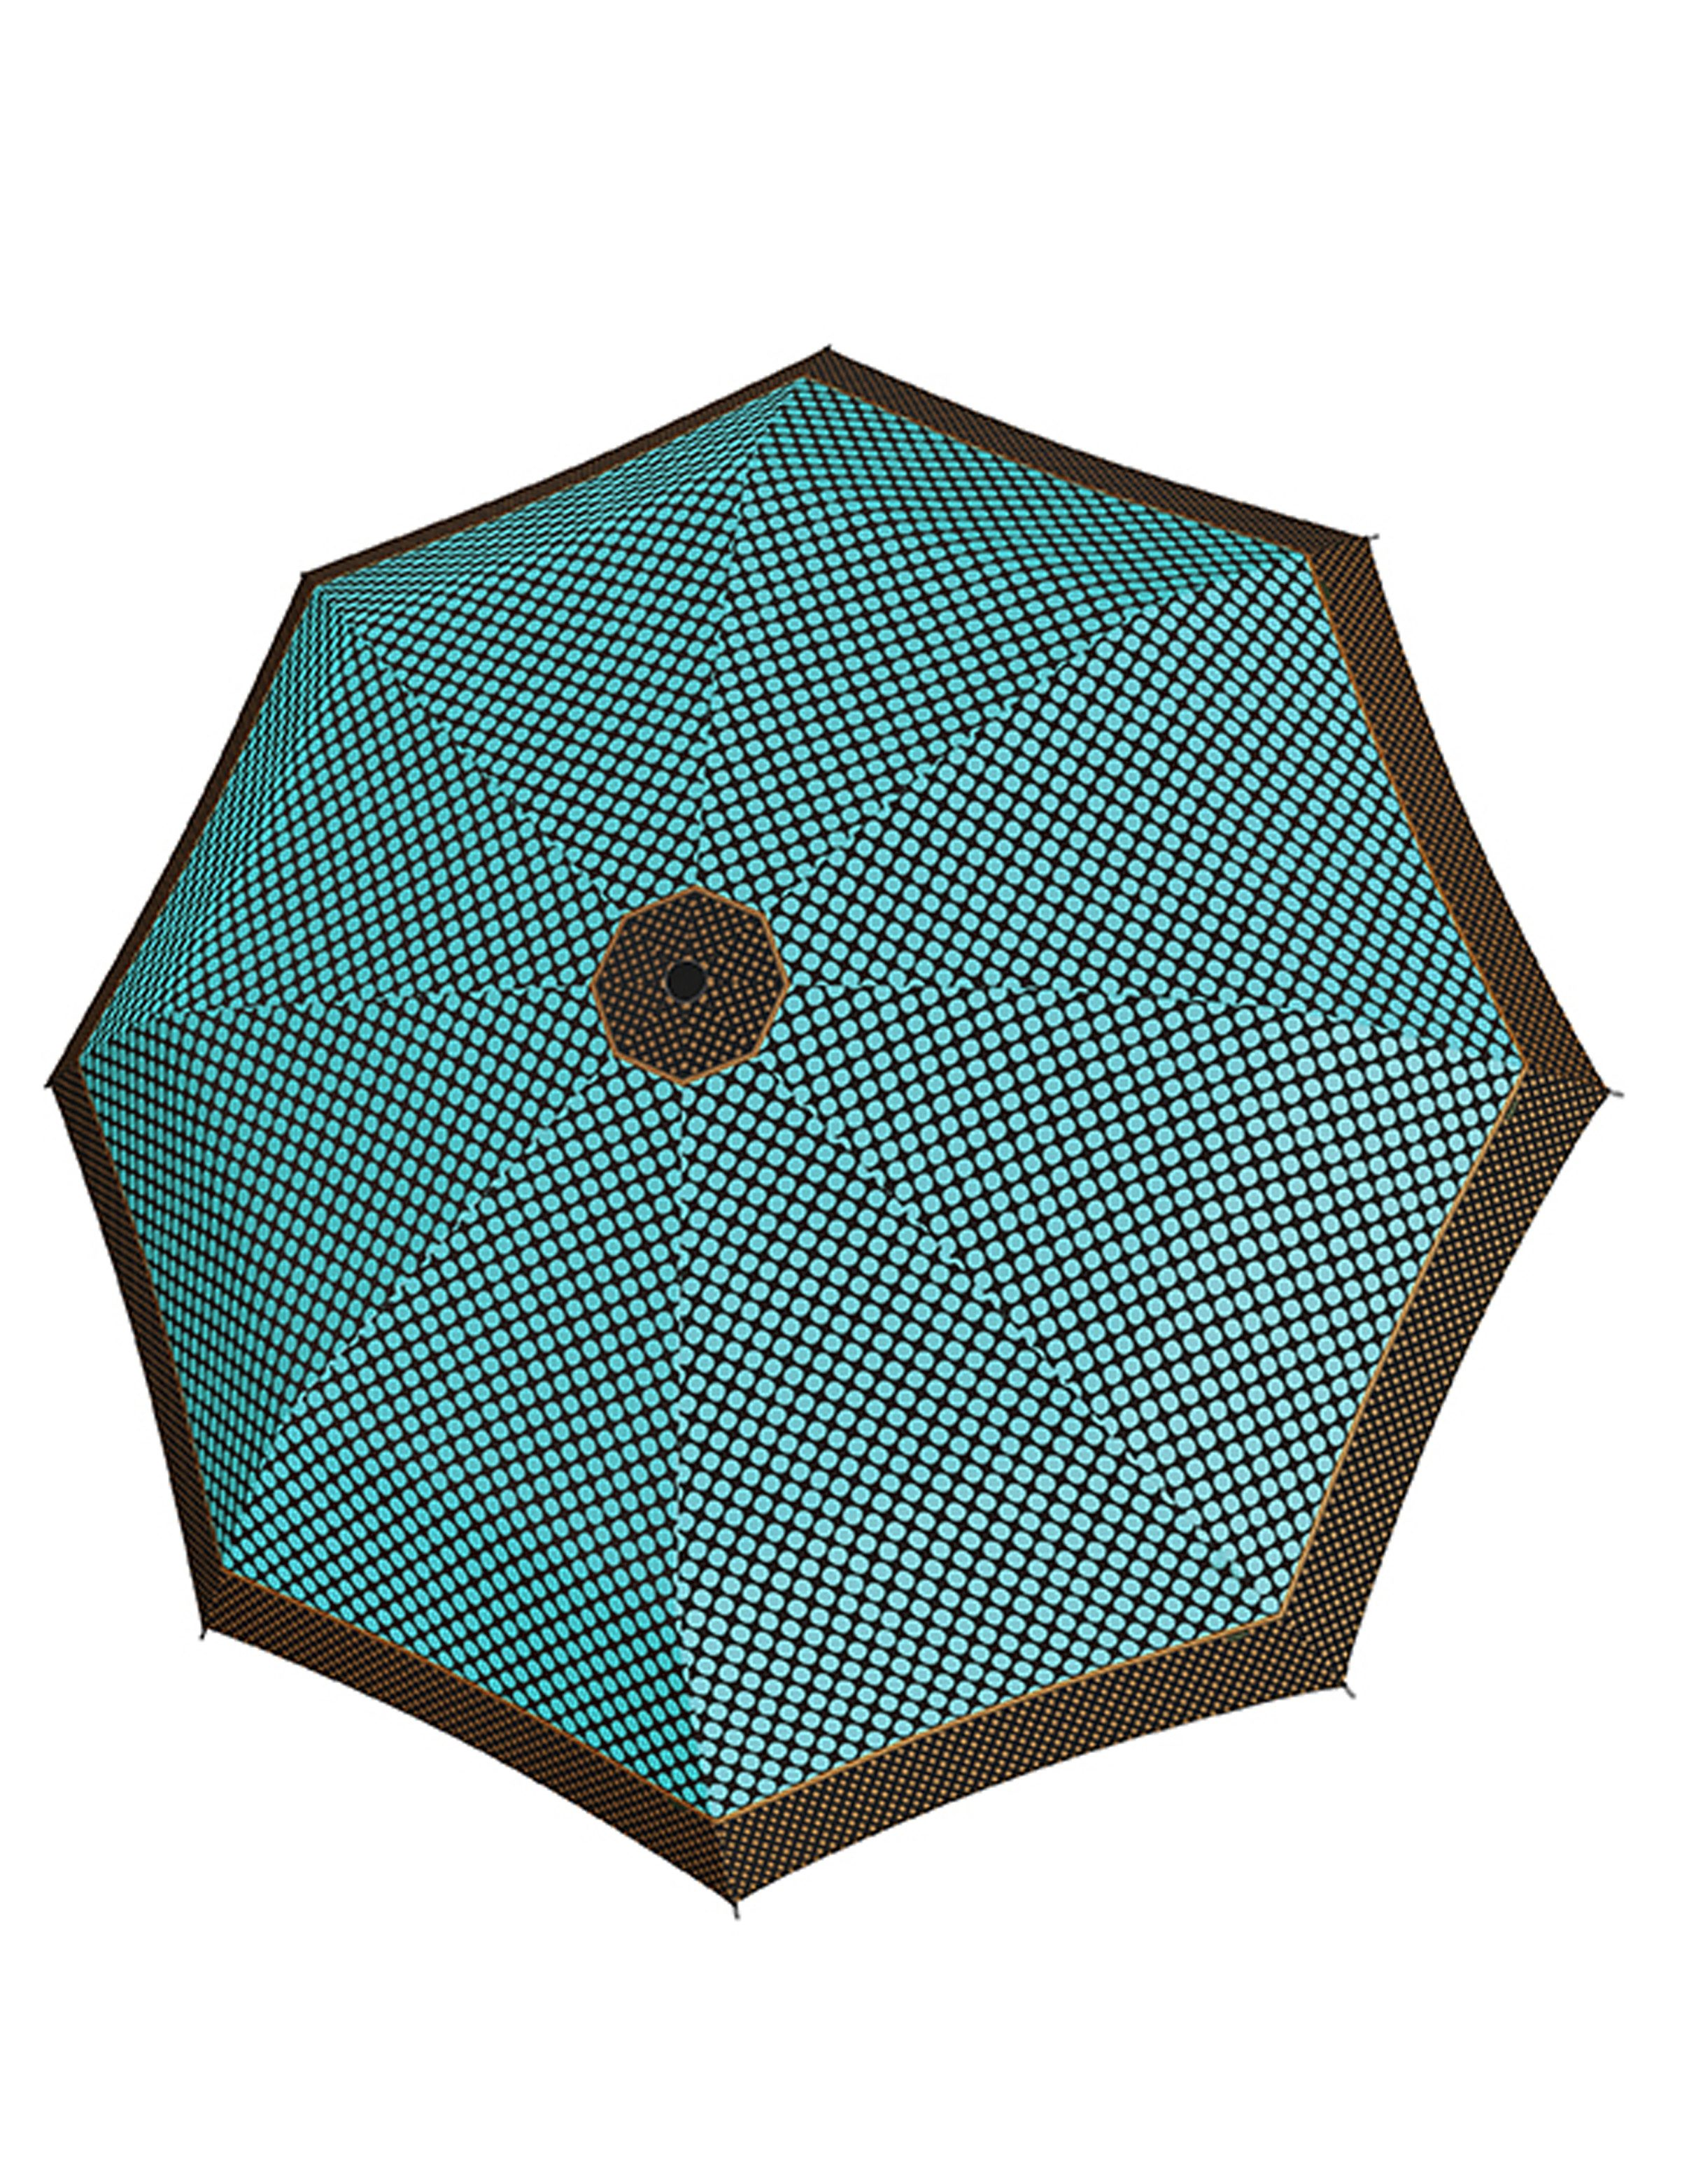 doppler® Regenschirm, Taschenschirm grün »Magic Carbonsteel Sparkling«